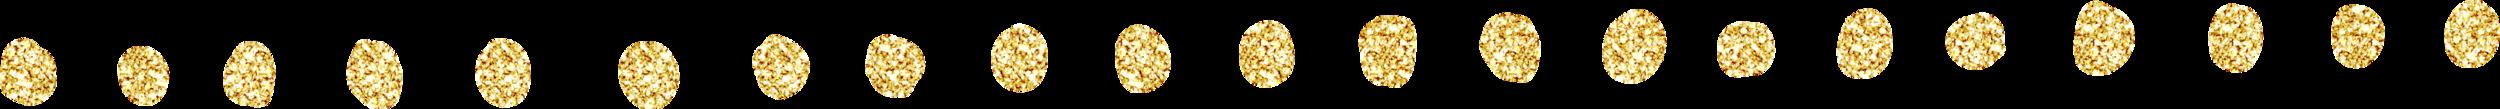 goldglitterborder10.png